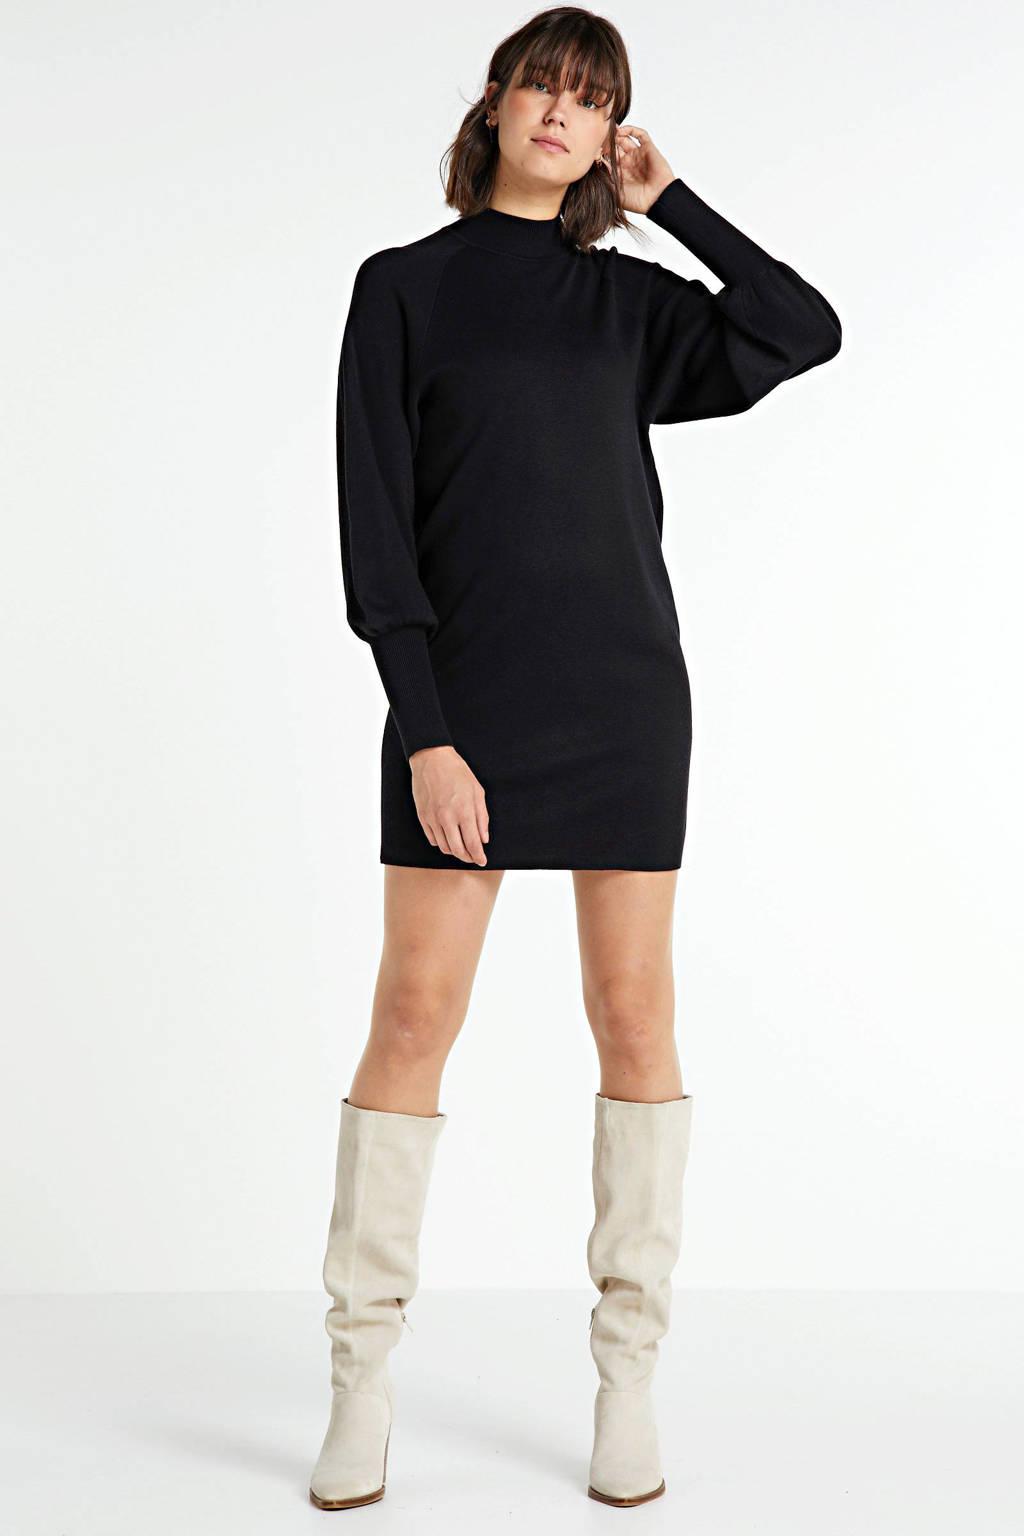 Inwear fijngebreide jurk Sanja zwart, Zwart